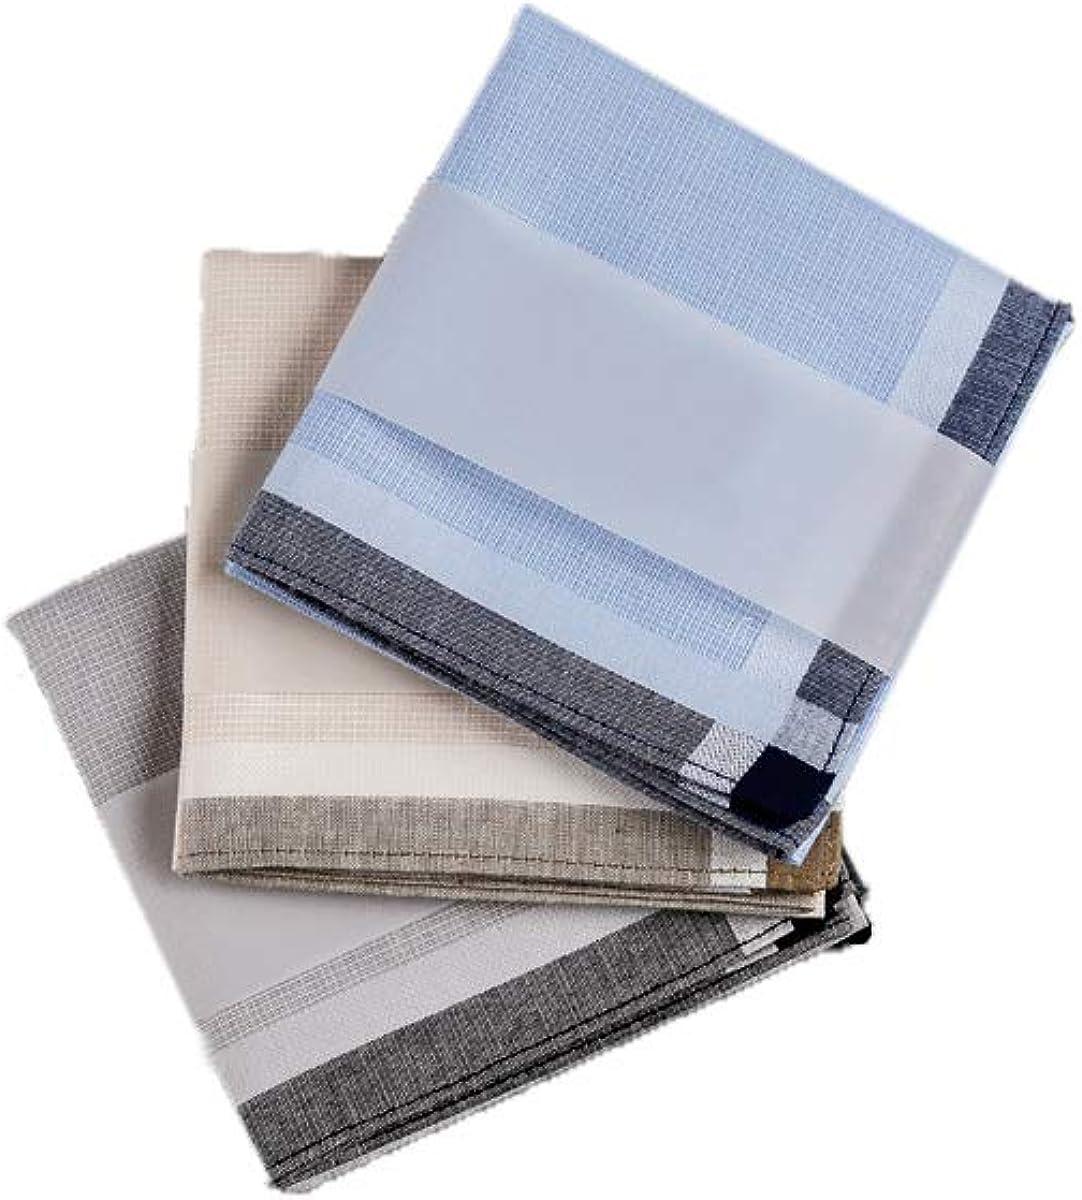 zelue Men's 100% cotton Stripe Soft Checkered Pattern Handkerchiefs assorted color pack of 3gift set by zelue